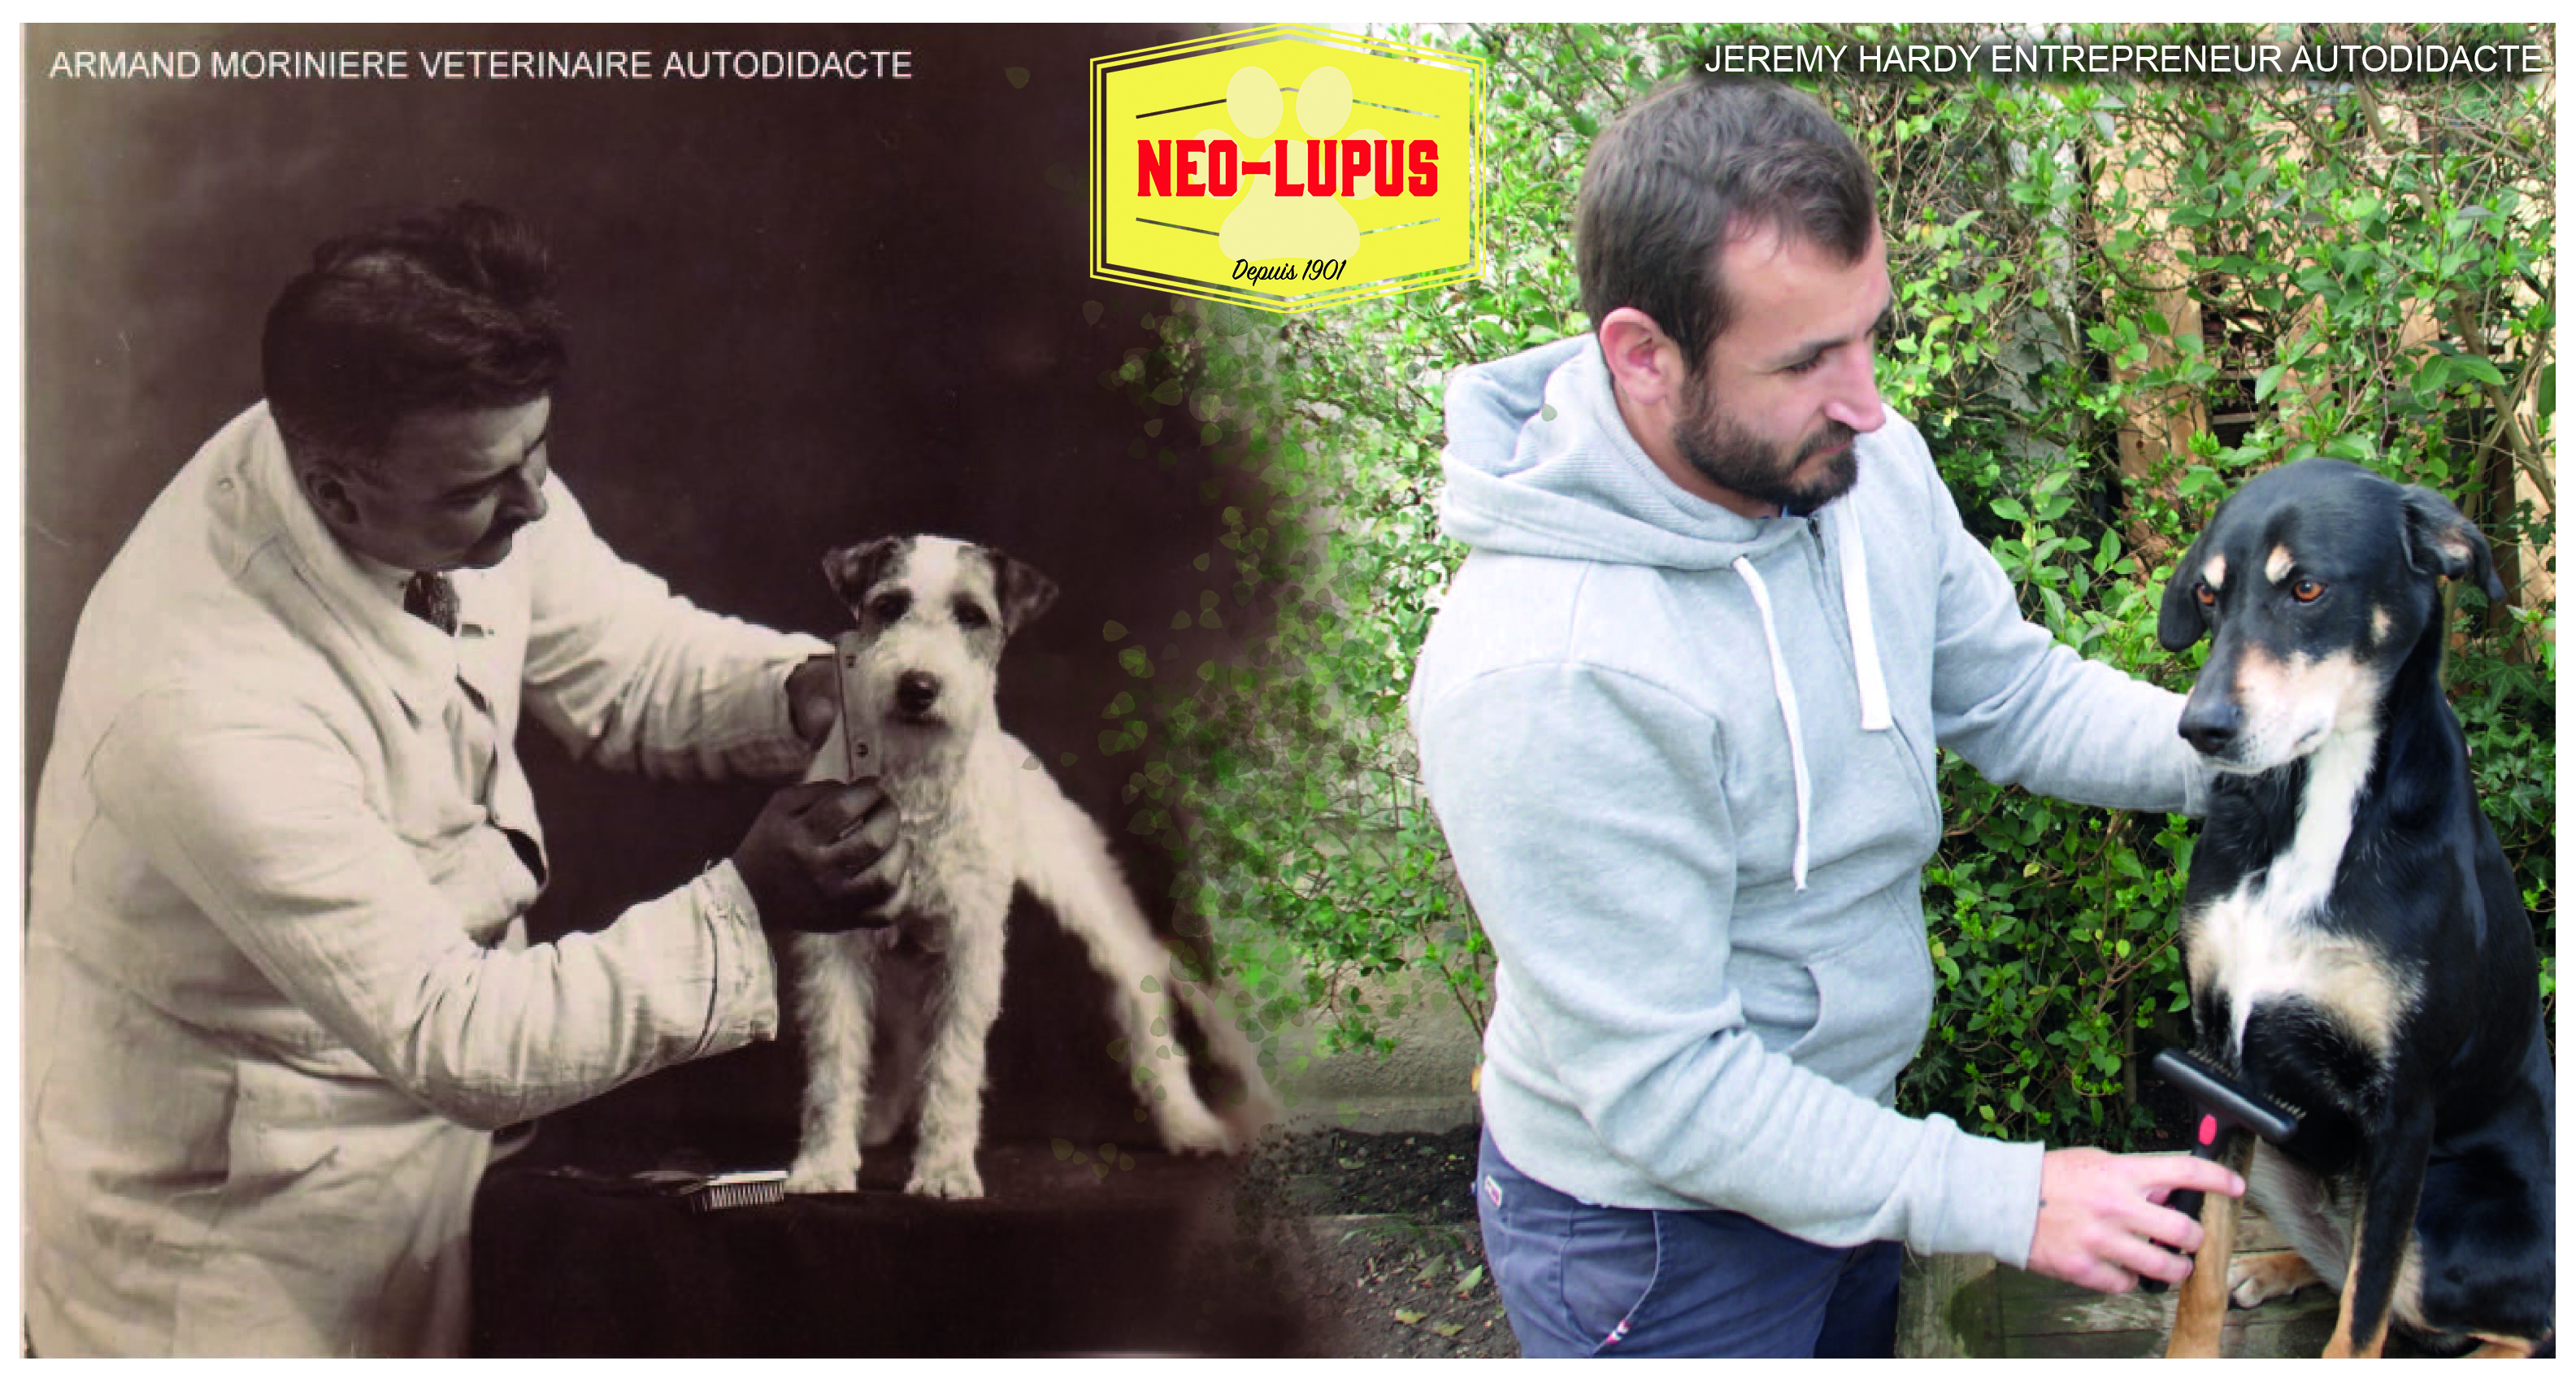 LES CAMPEURS #37 : Néo-Lupus